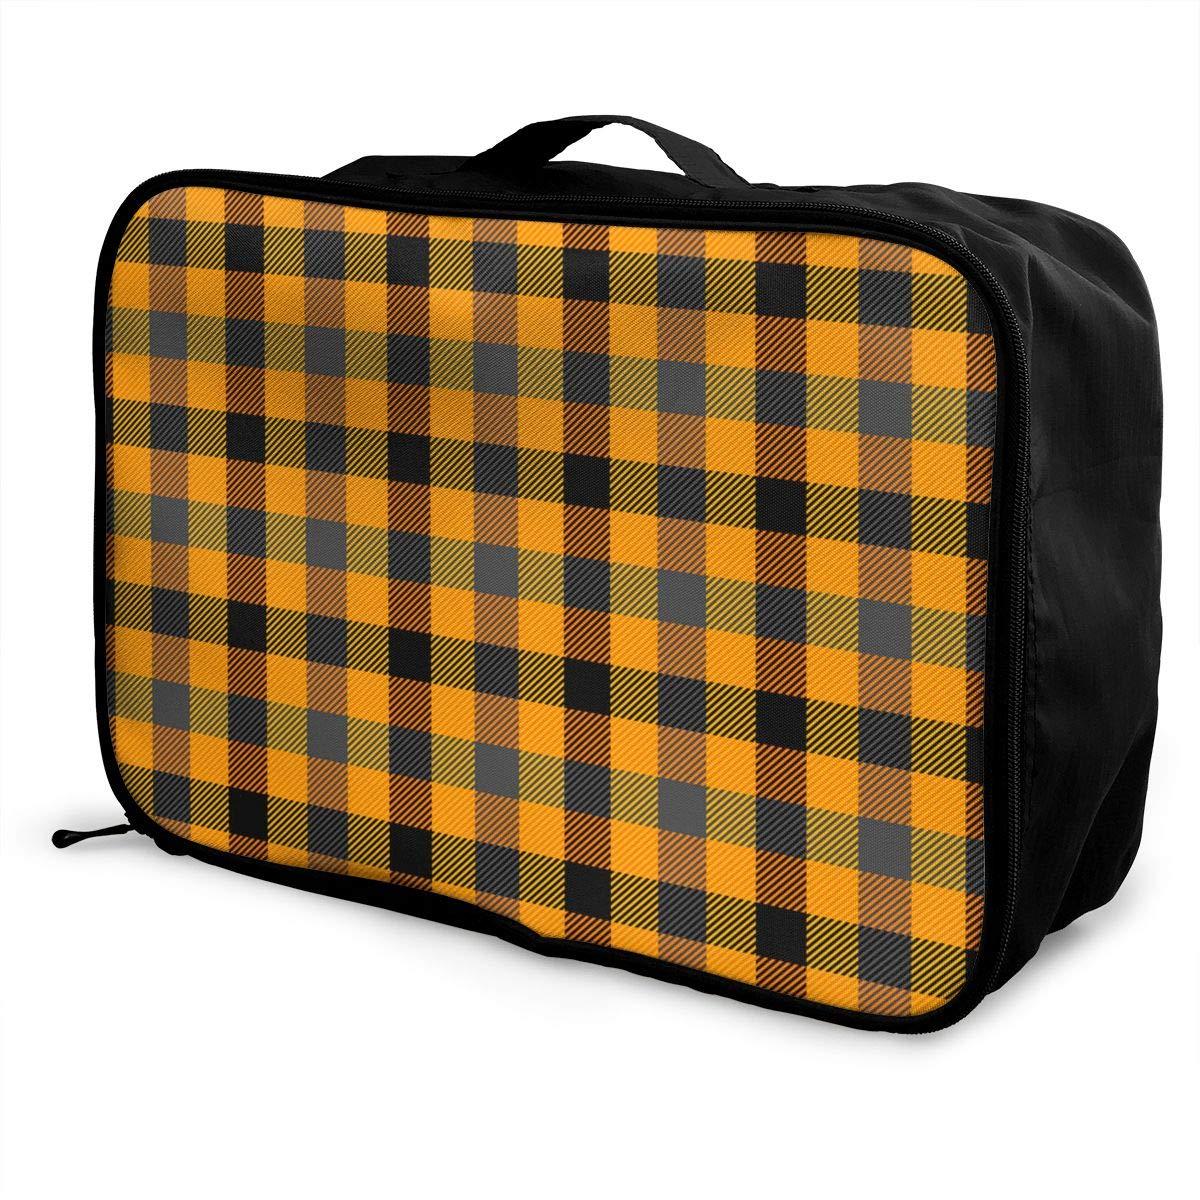 ADGAI Halloween Tartan Plaid Pattern Scottish Cage Canvas Travel Weekender Bag,Fashion Custom Lightweight Large Capacity Portable Luggage Bag,Suitcase Trolley Bag